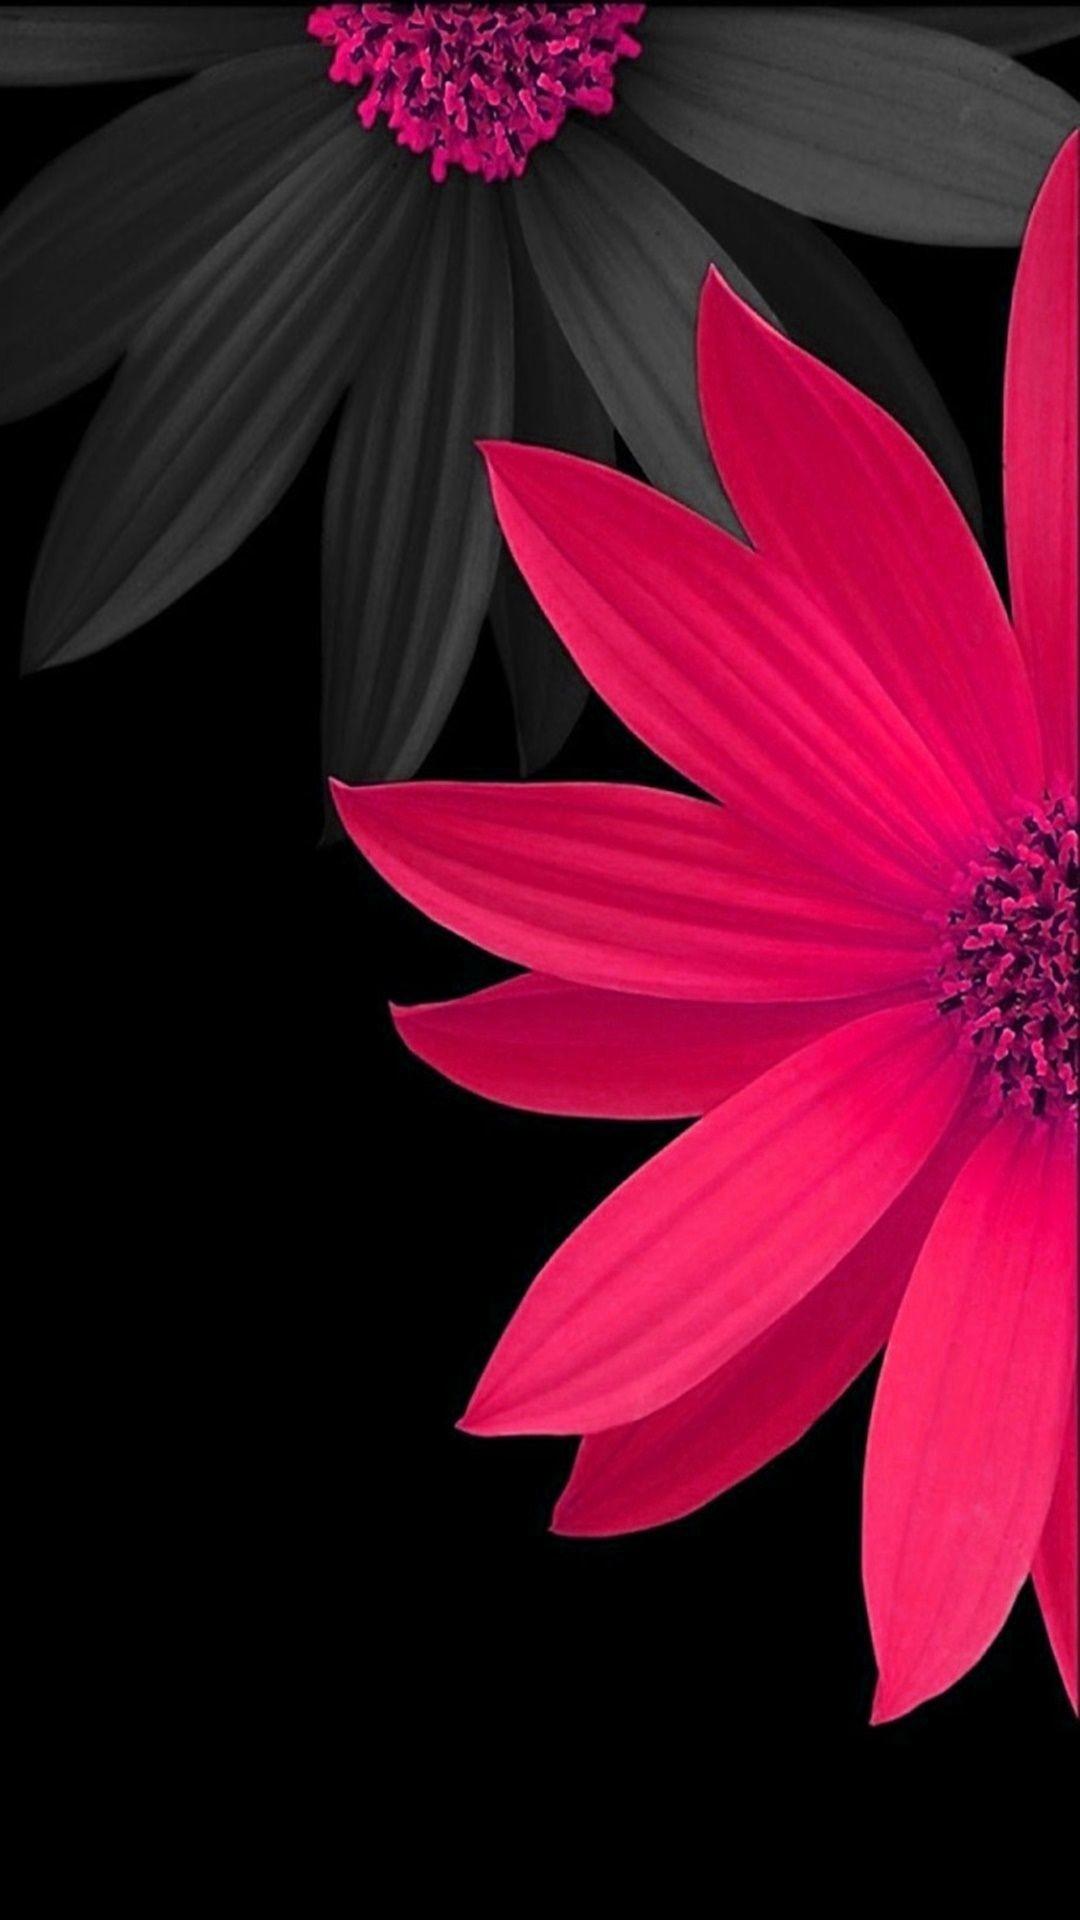 Black Flower Wallpaper 64 Images